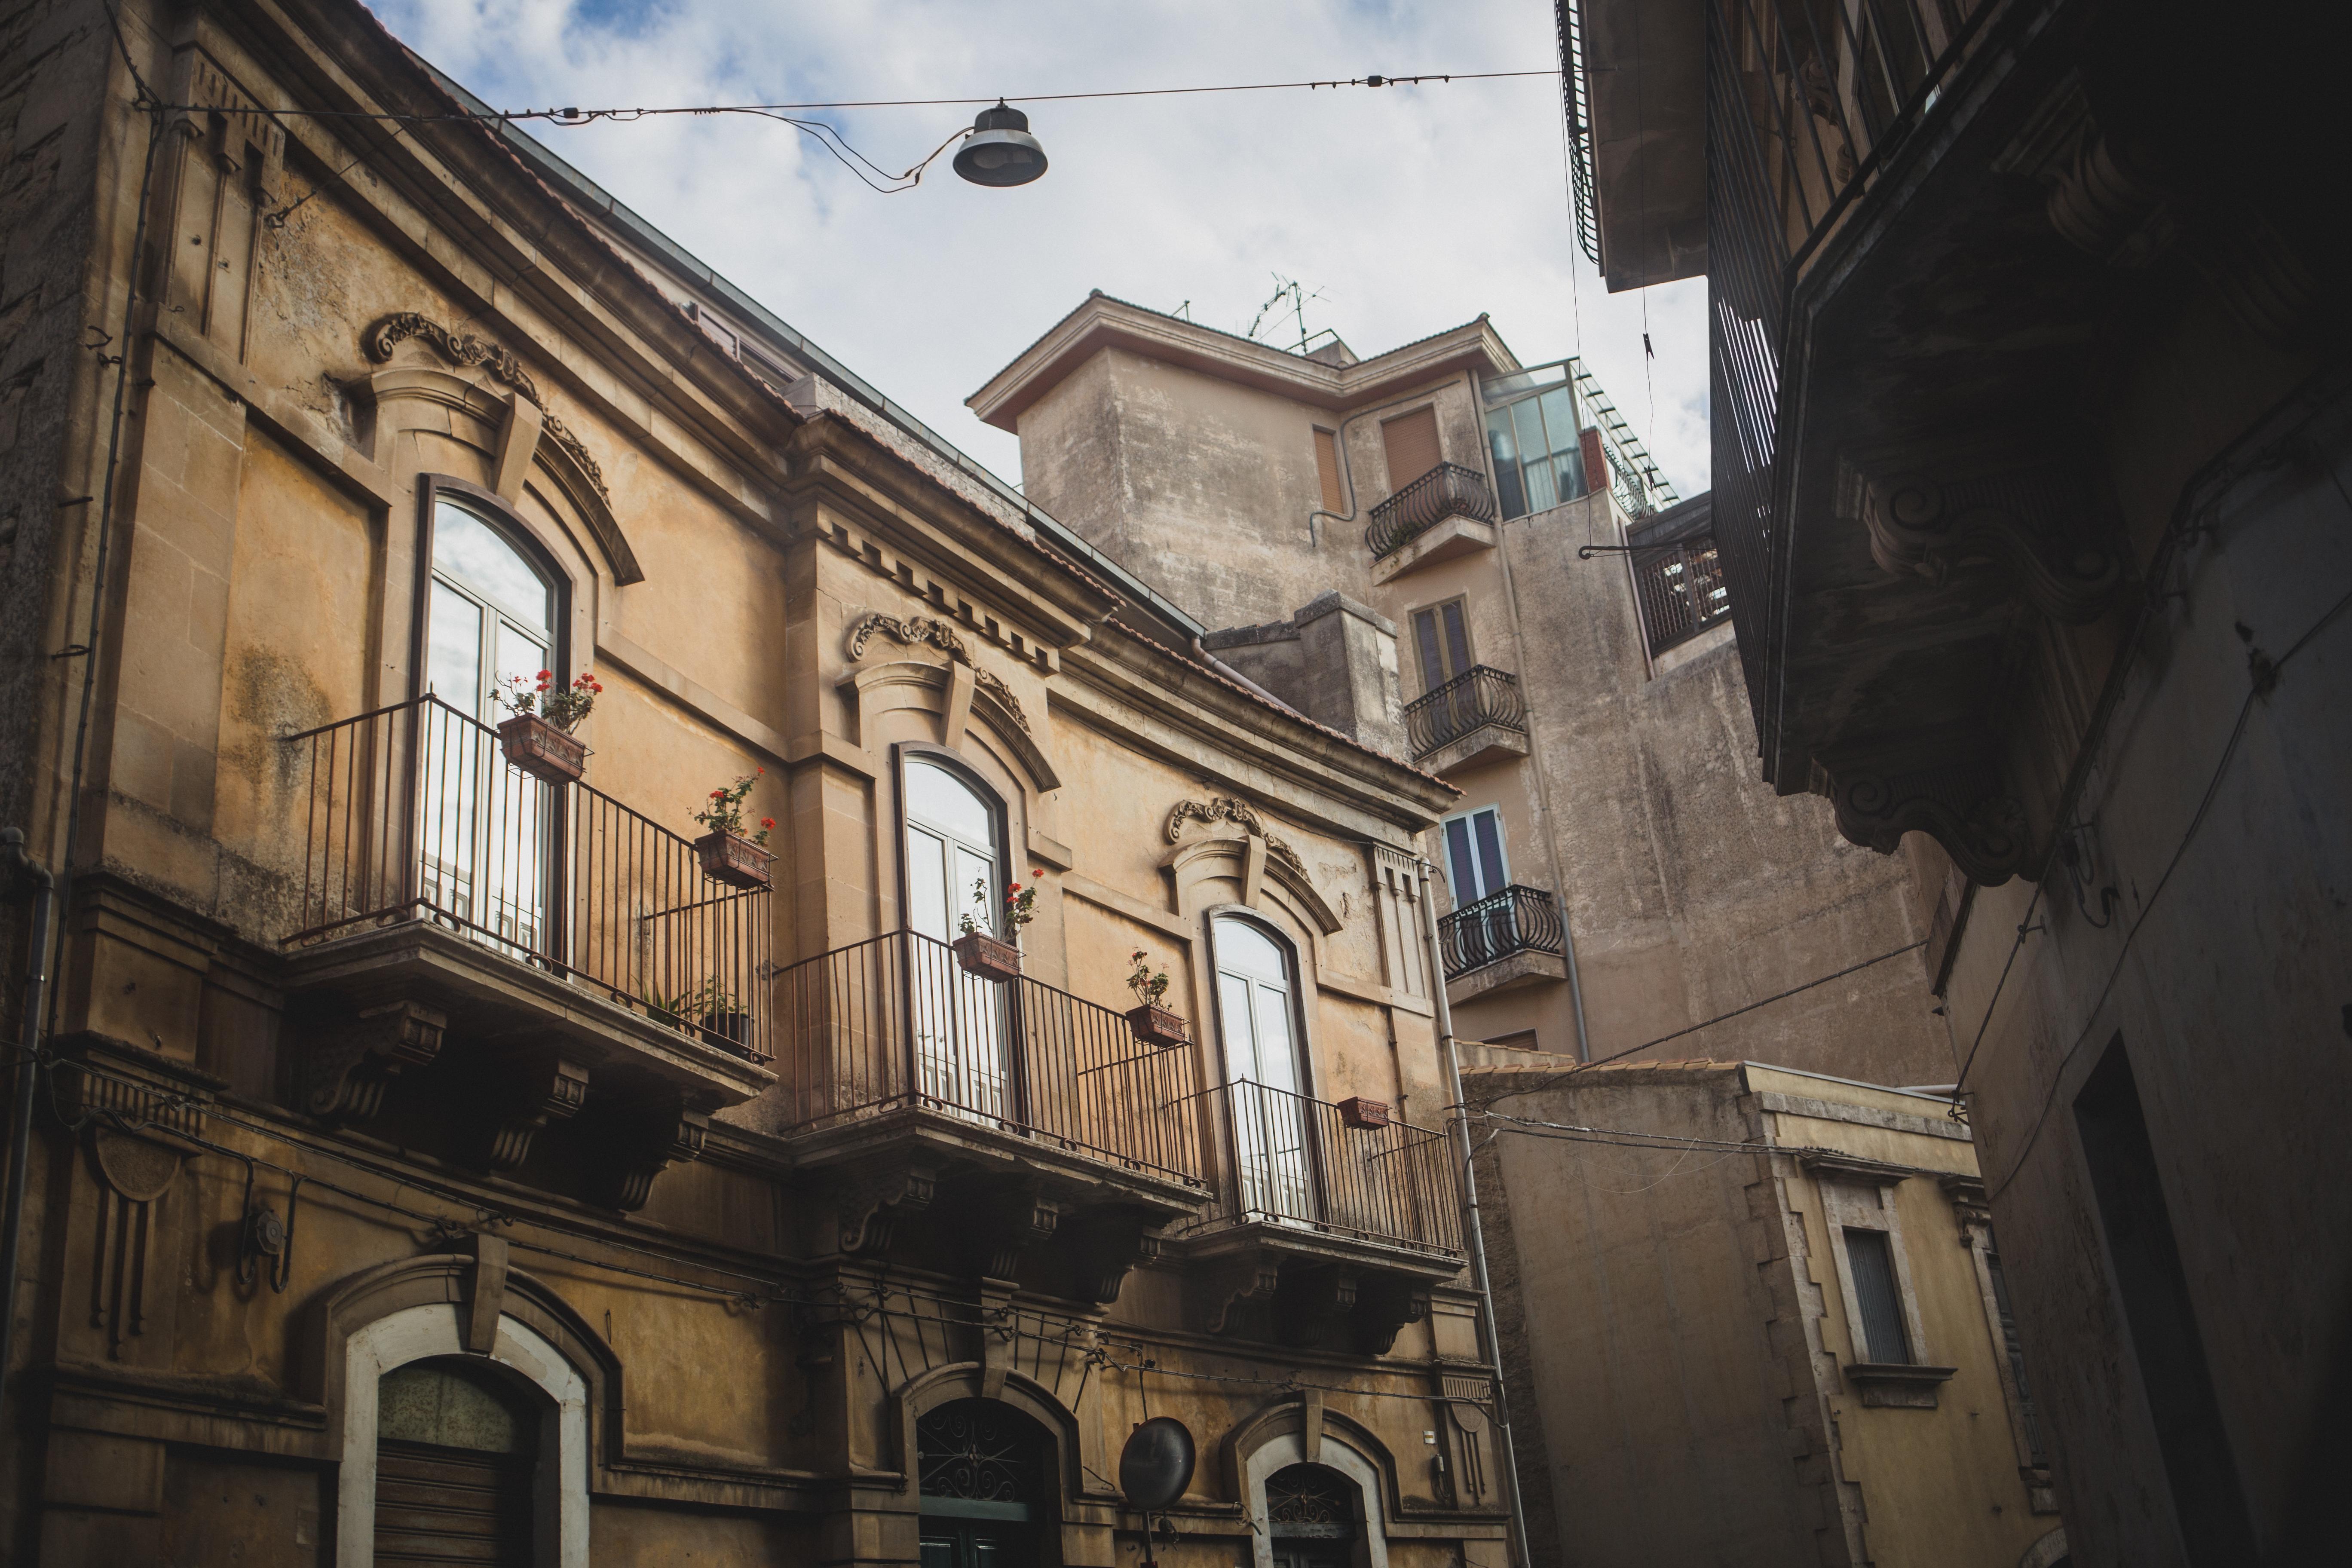 Sizilien, Sicily, Carolin Weinkopf